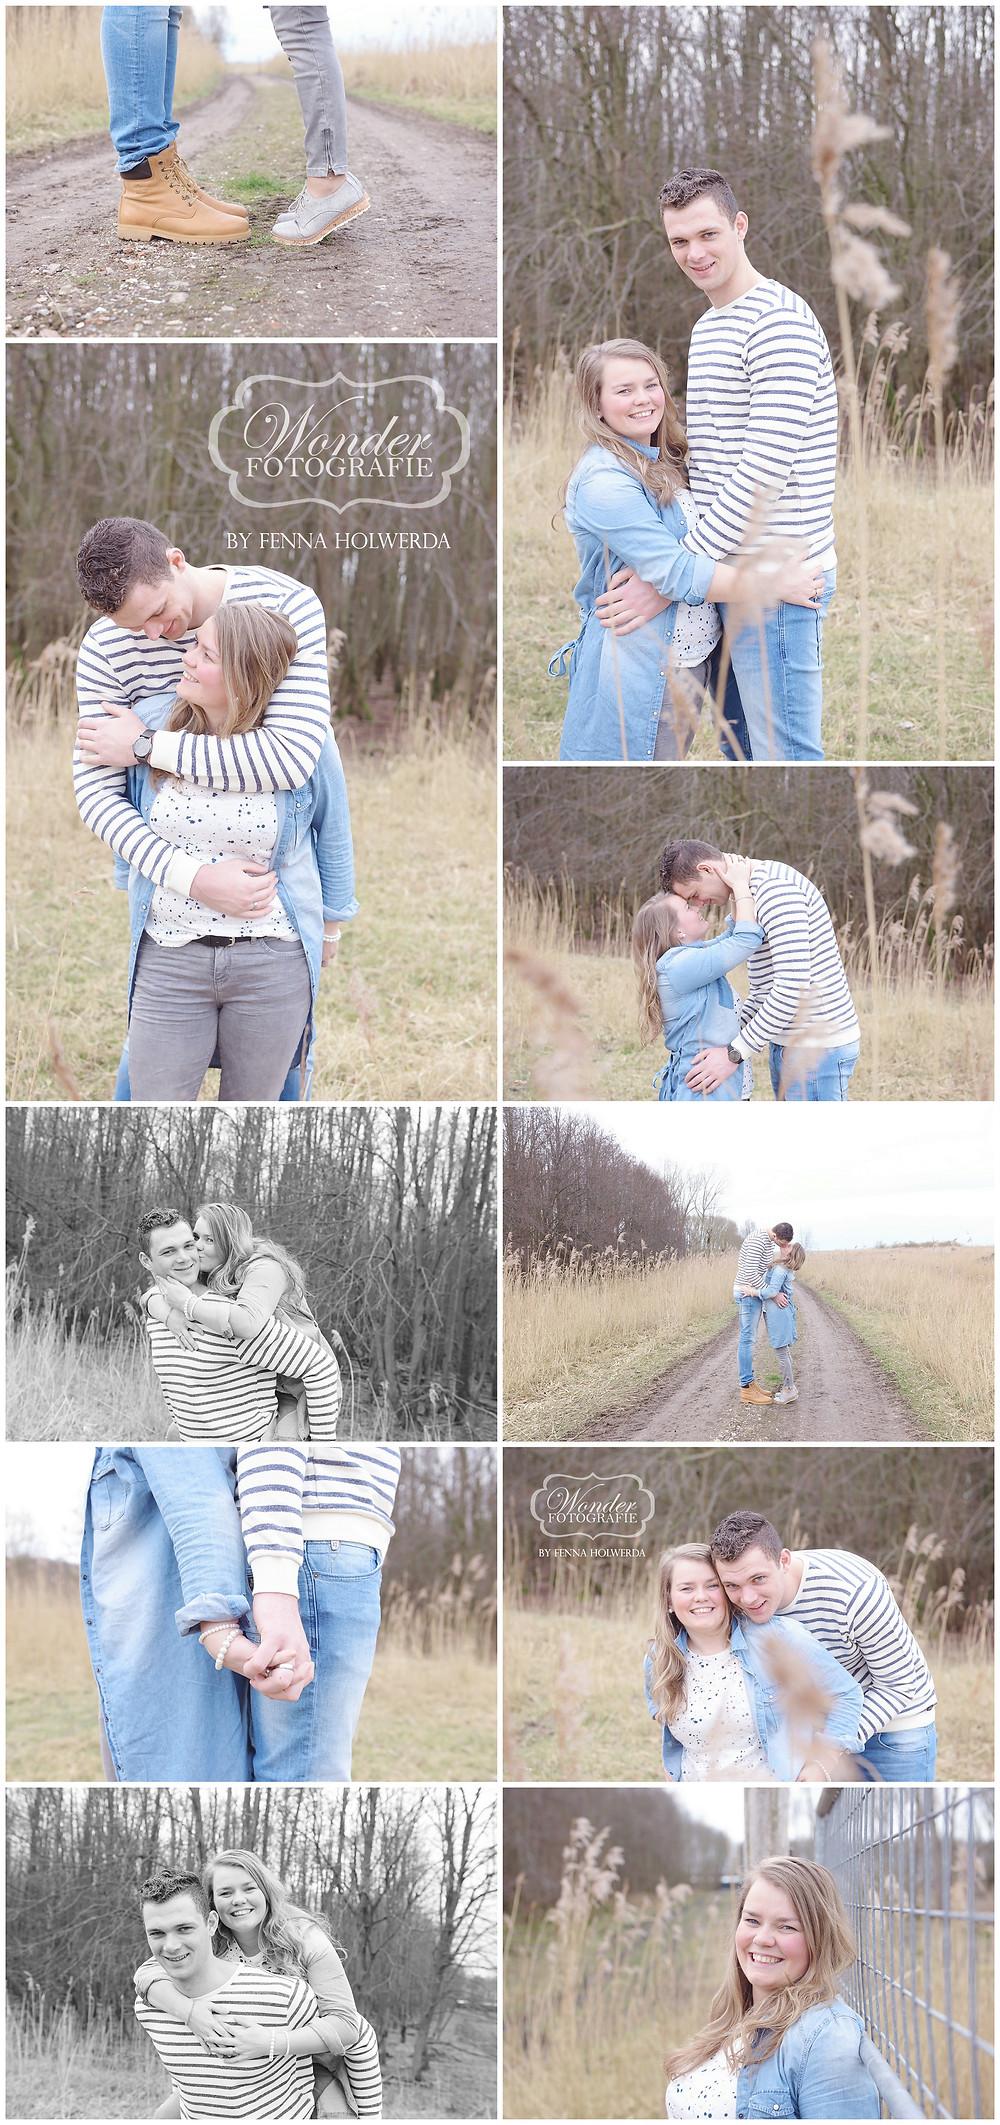 gratis shoot fotoshoot loveshoot verlovingsfoto verlovingsfotoshoot oefenfotoshoot lengteverschil bruid bruidegom